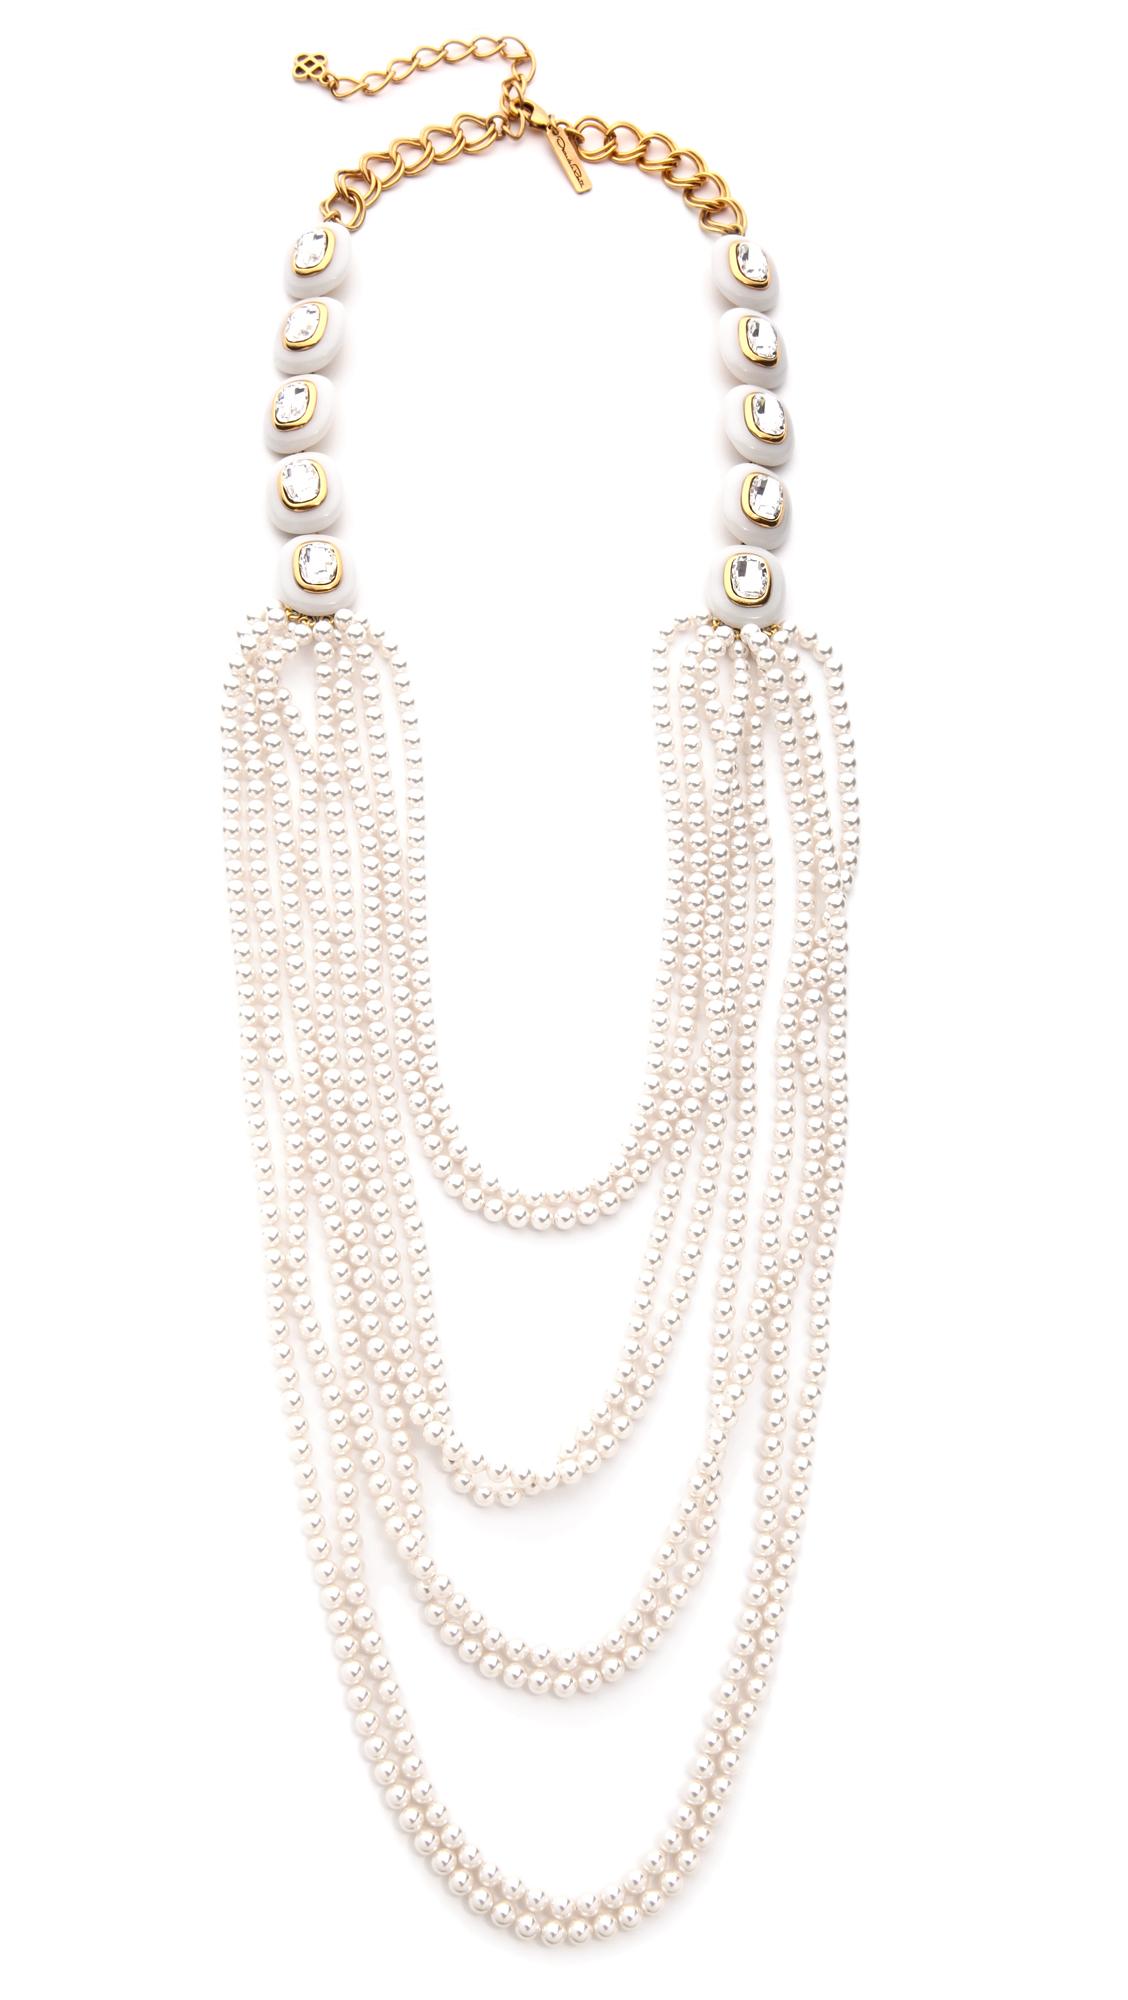 Oscar De La Renta Multi-Strand Simulated Pearl Necklace 2PAa3TW